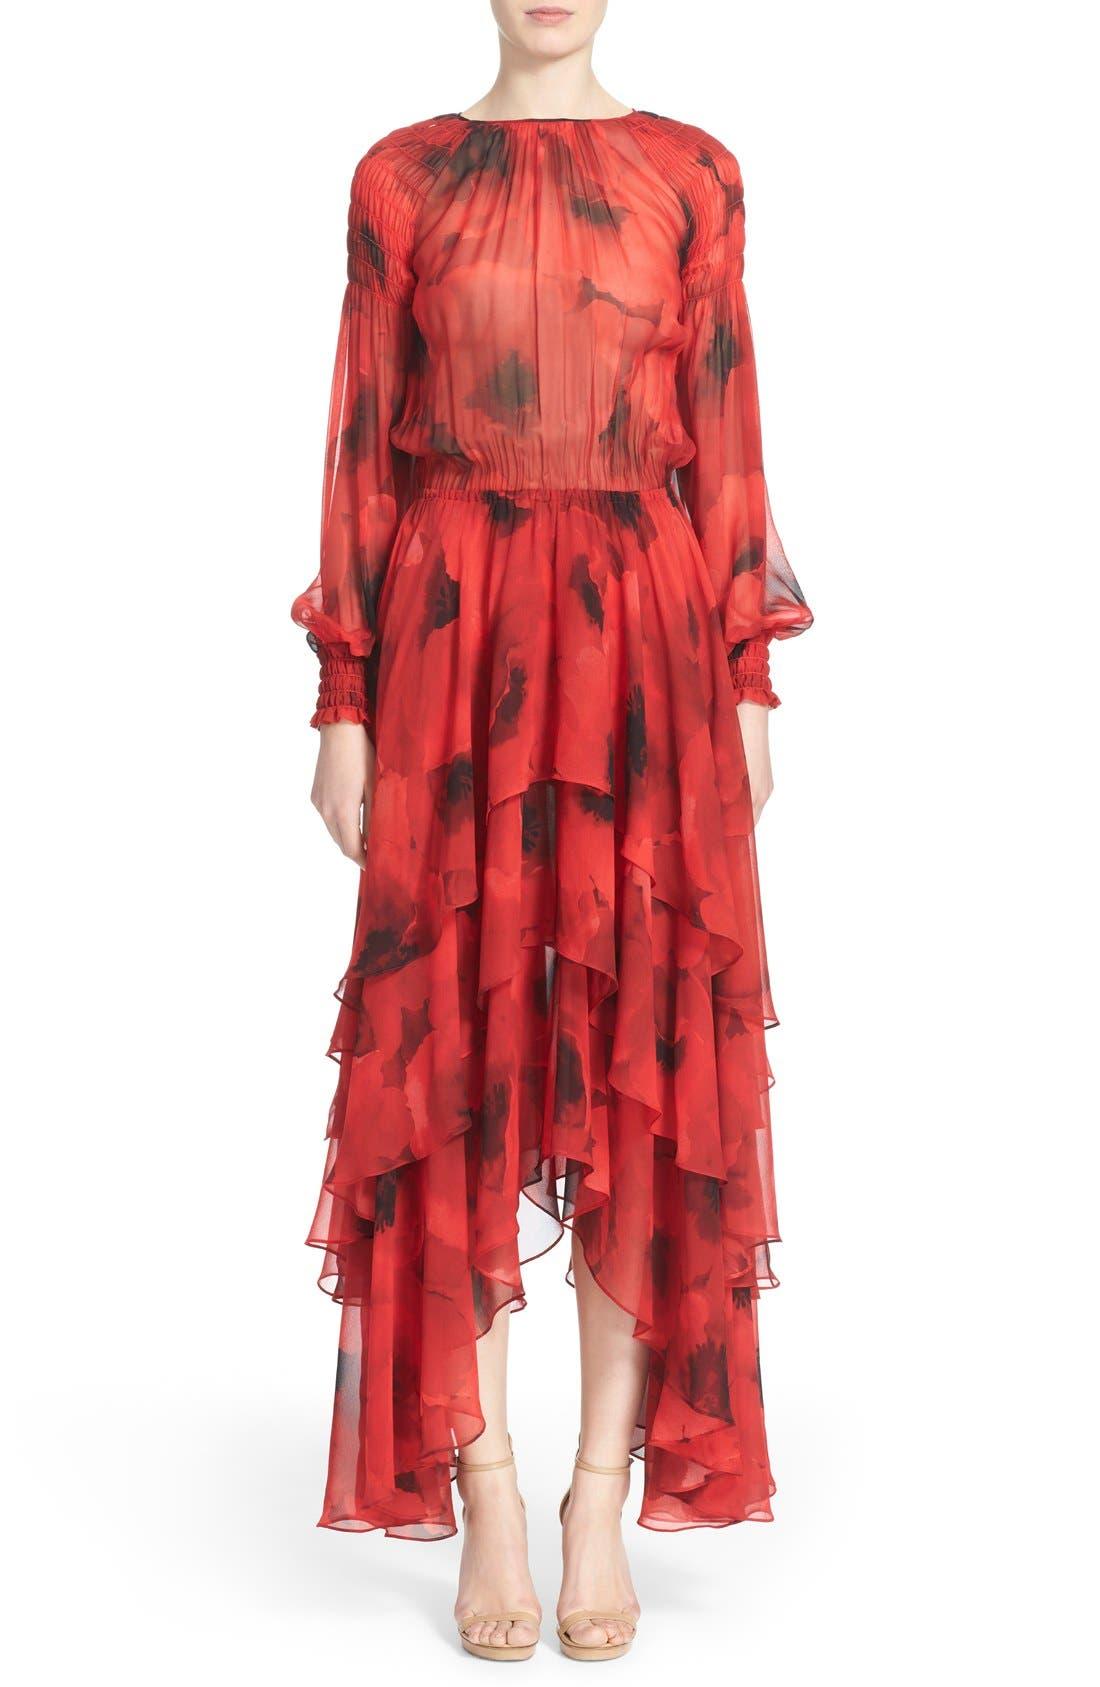 Alternate Image 1 Selected - Michael Kors Poppy Print Tiered Silk Peasant Dress